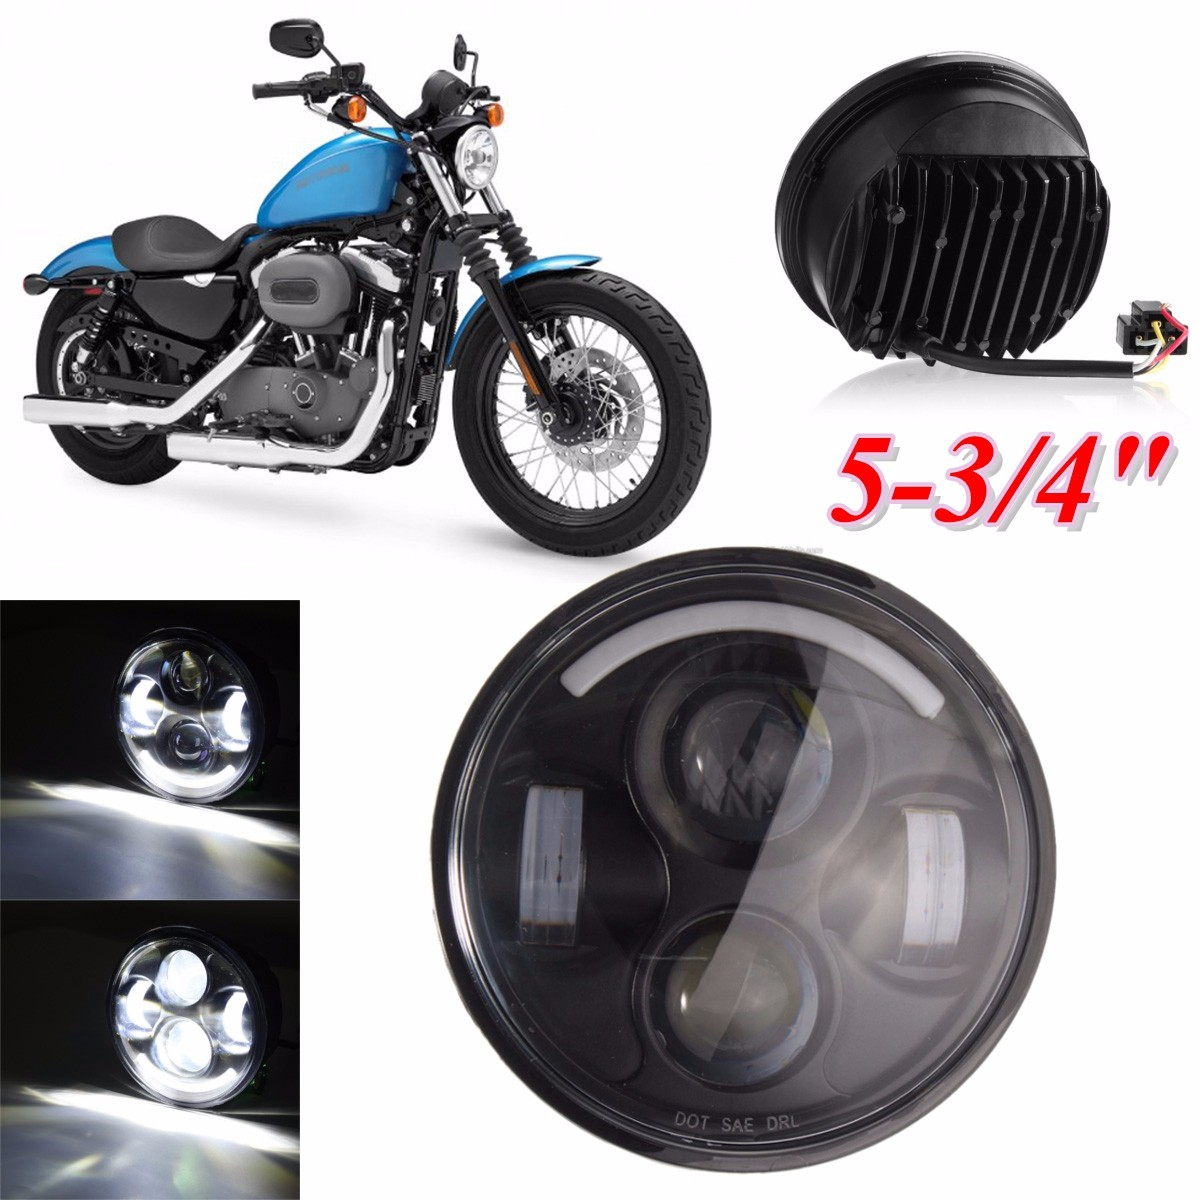 Graphique De Vente De Moto Harley Davidson